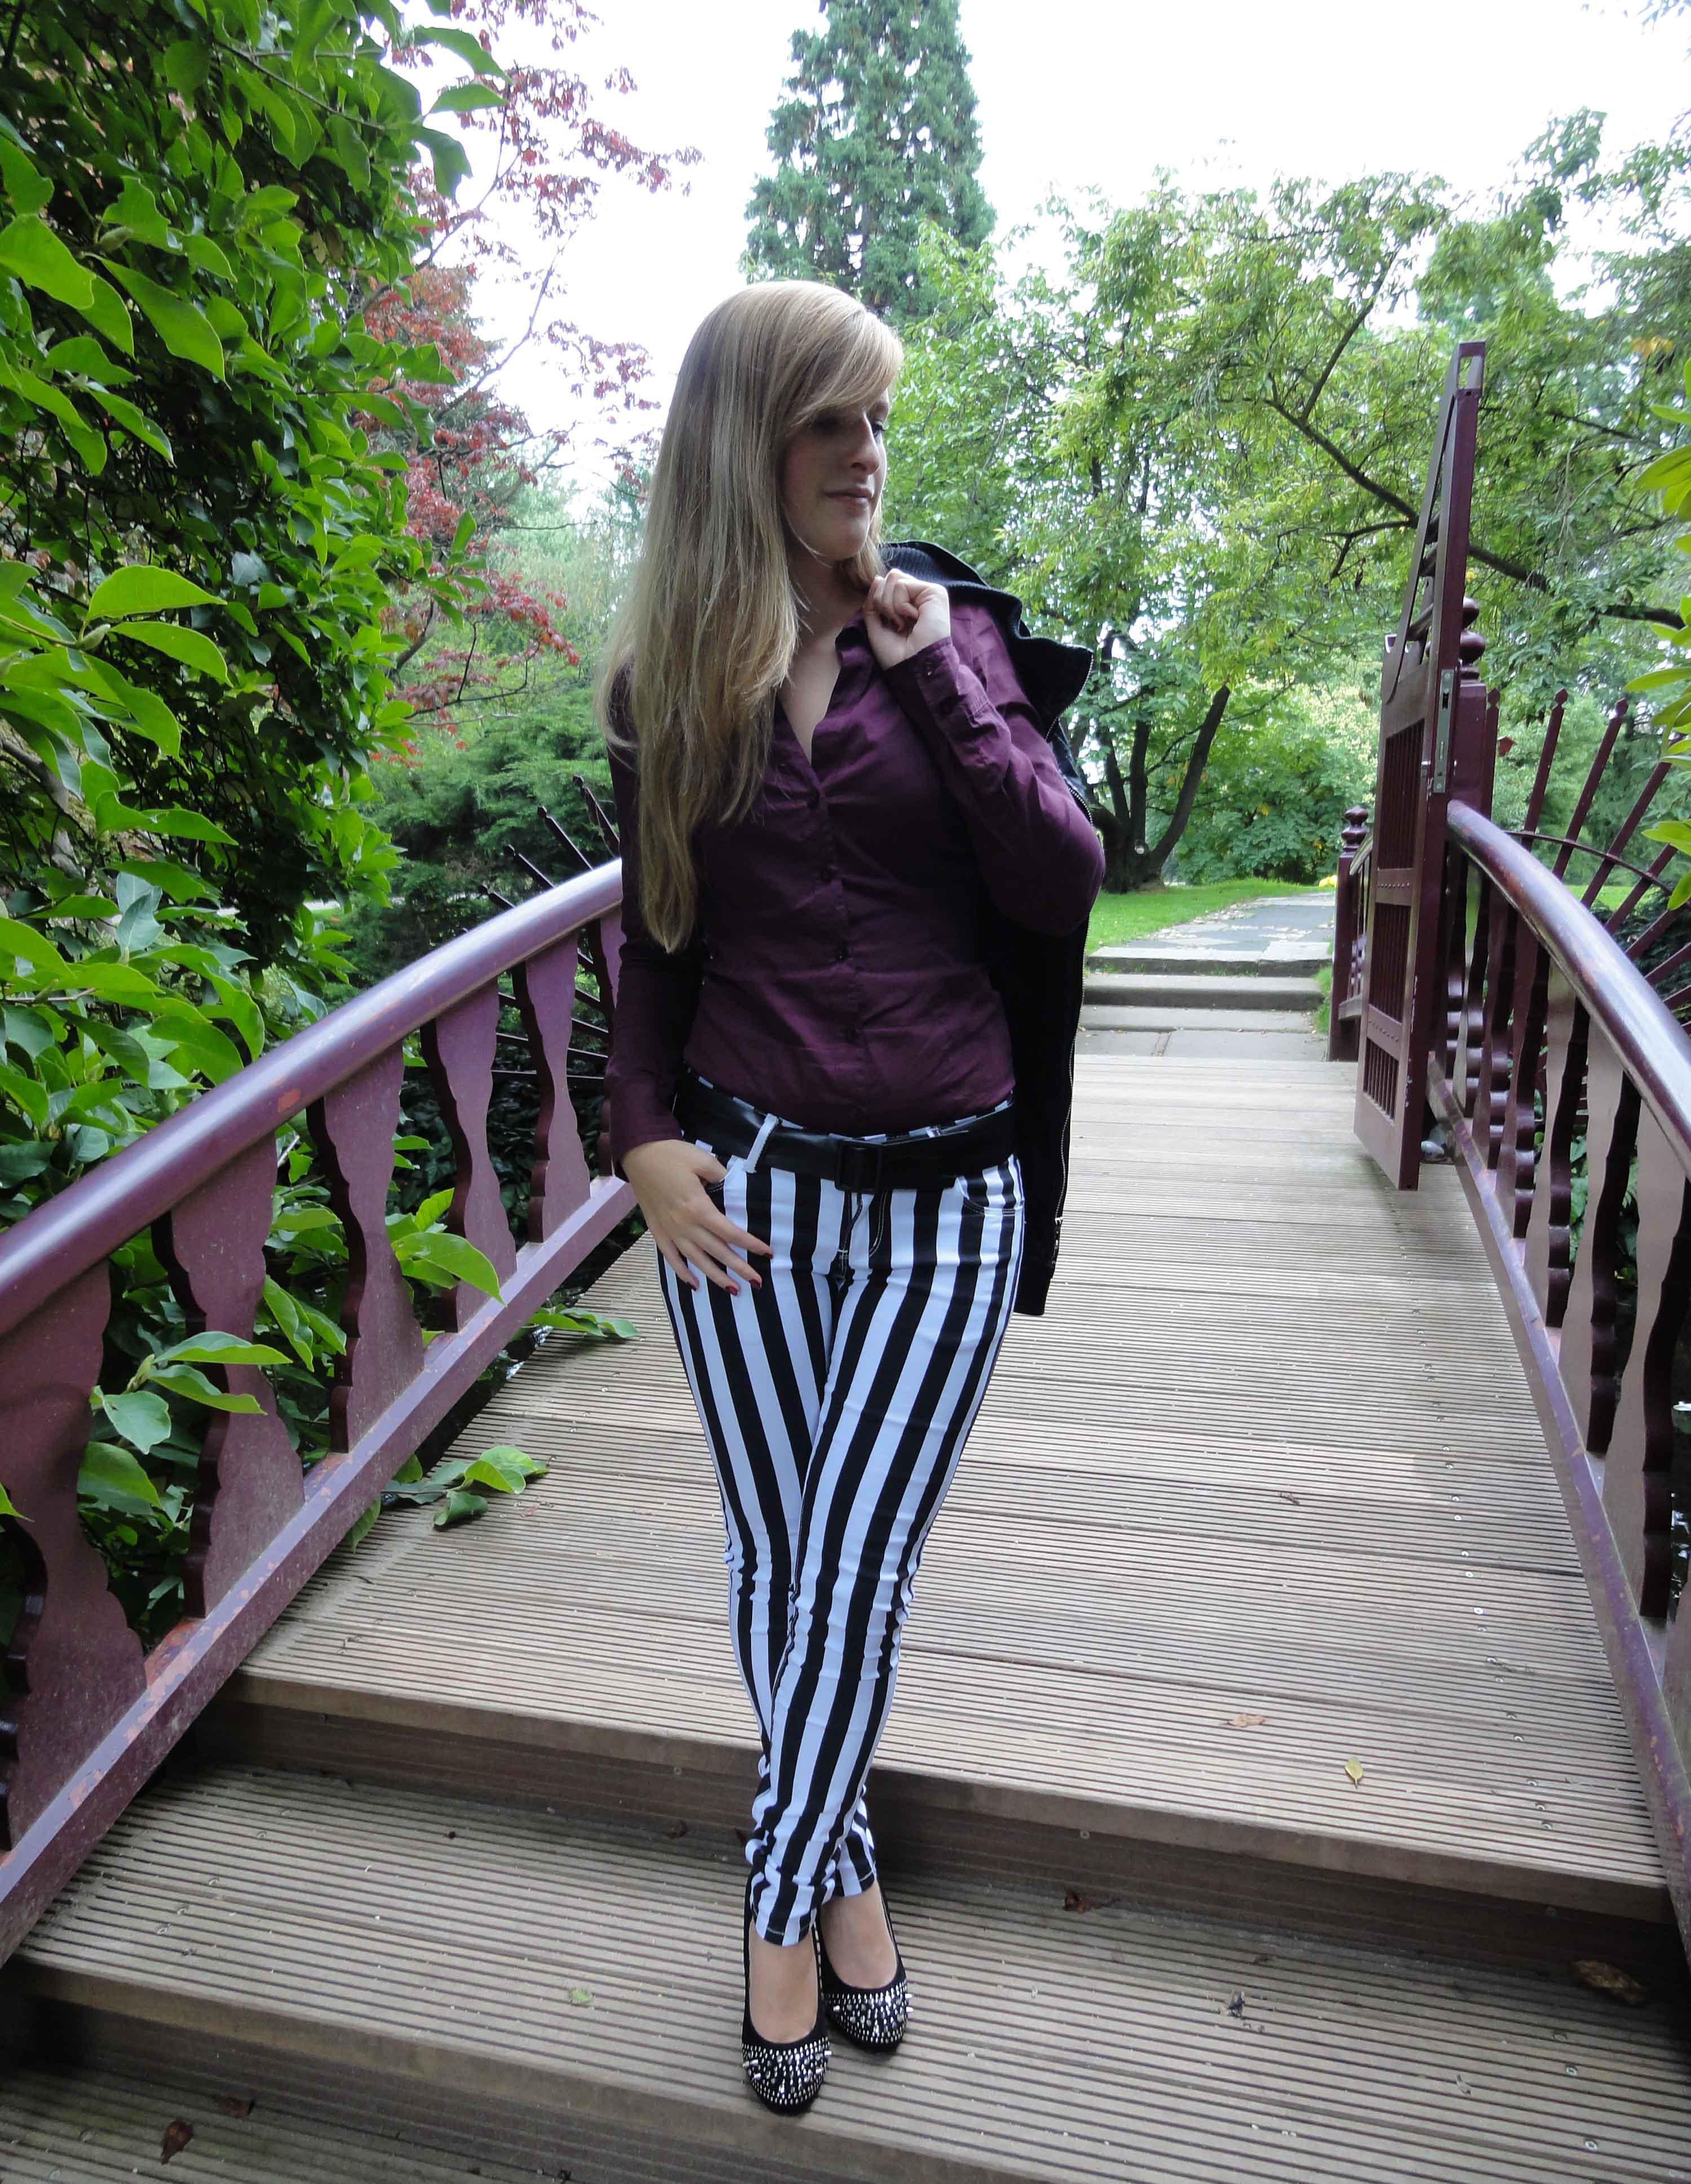 Stripes Rules Modeblog schwarz weiß gestreifte Hose kombinieren streifen Outfit schwarze Lederjacke jajpanischer Garten 2